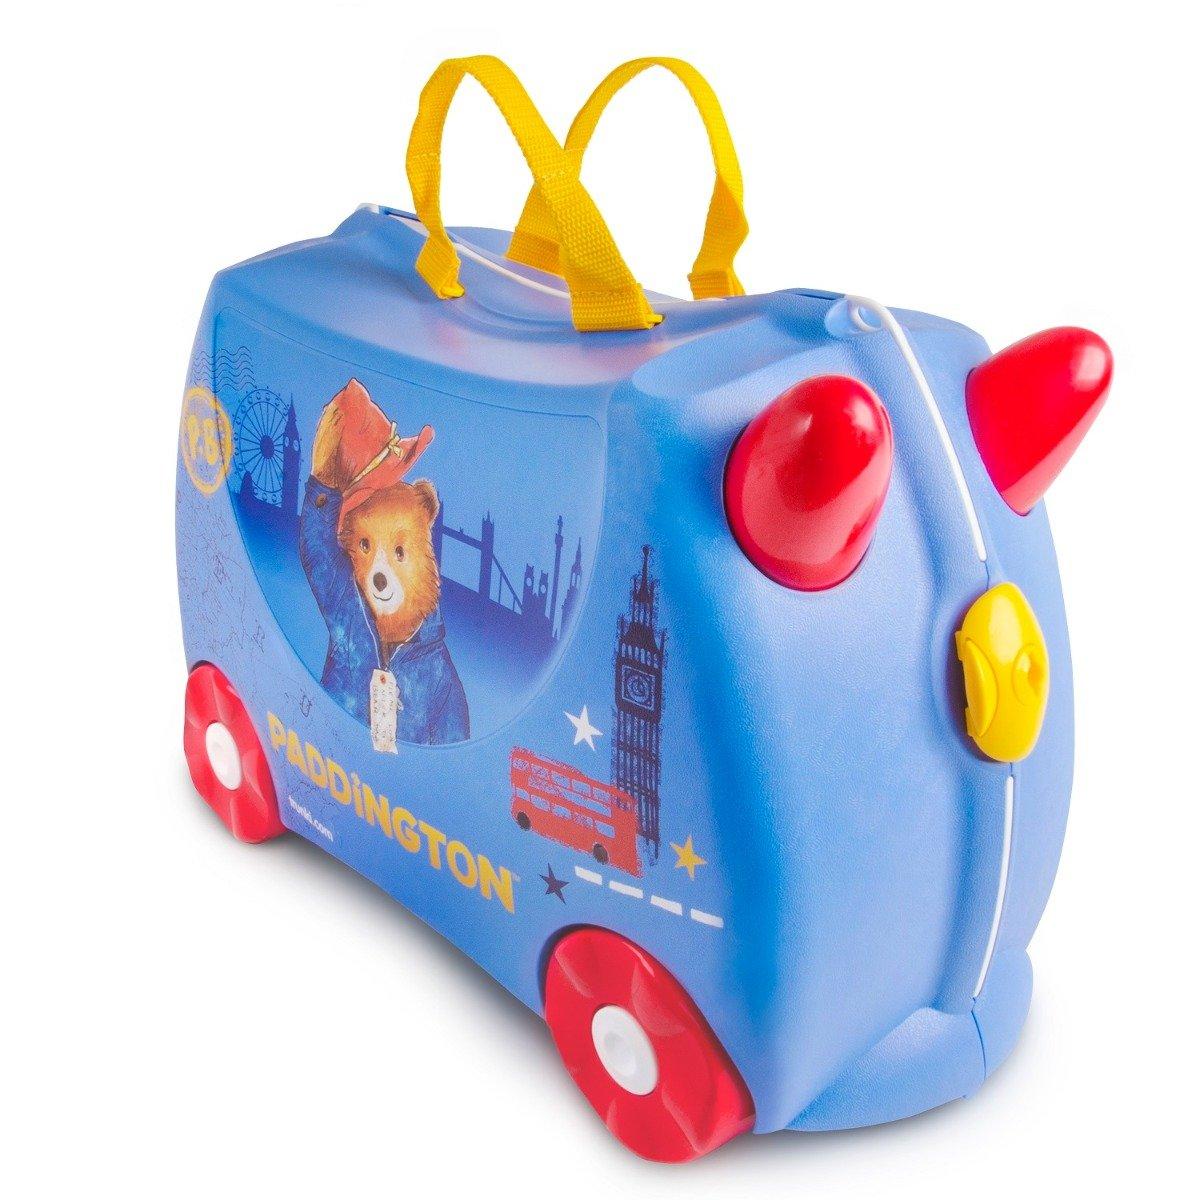 Valiza pentru copii Trunki Ride-On Paddington, Albastru imagine